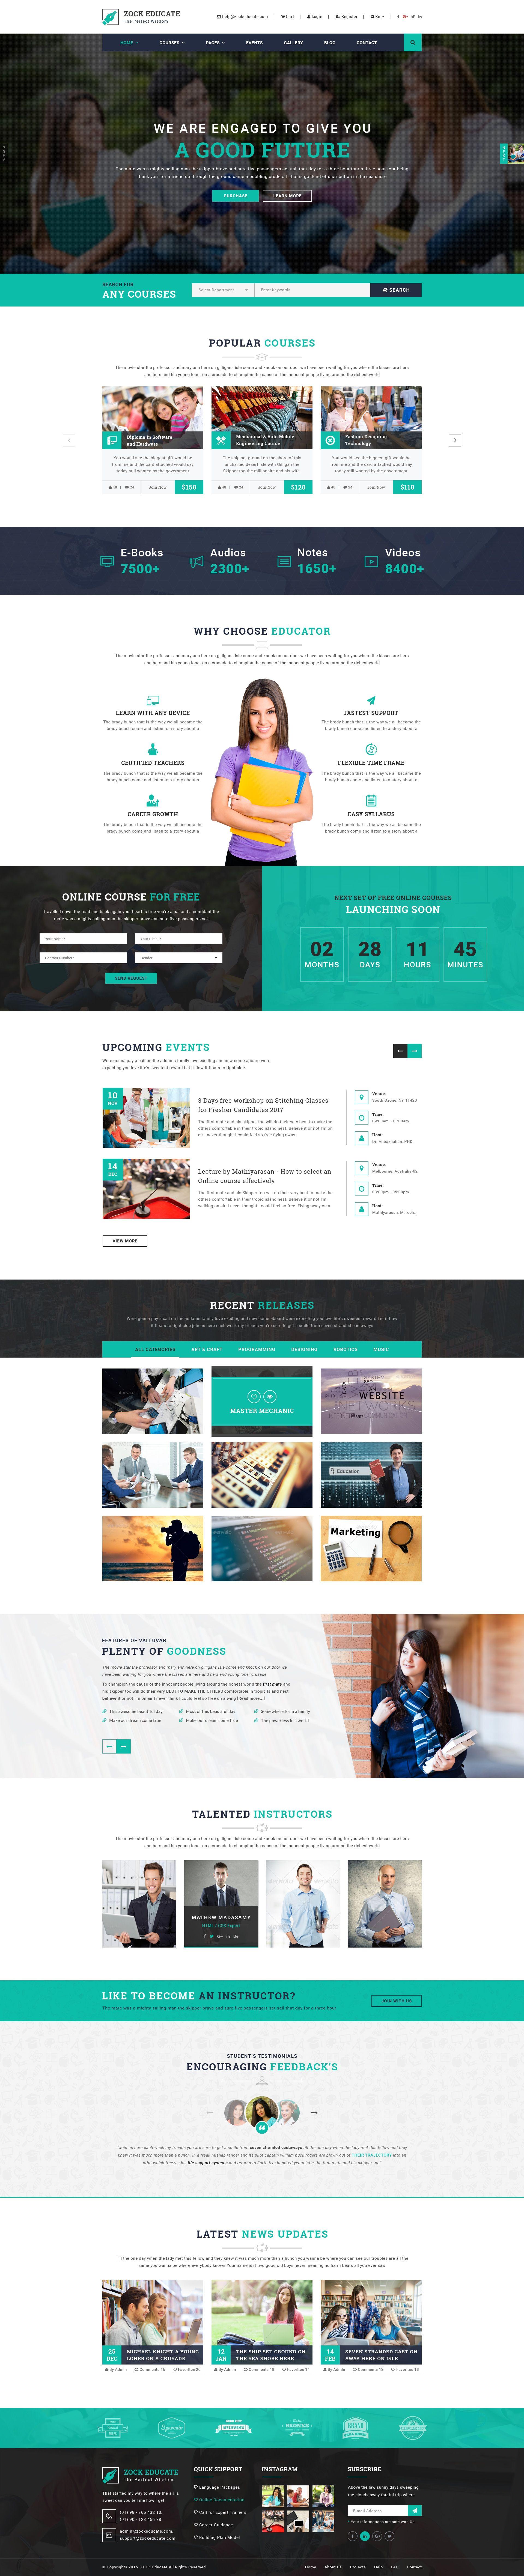 Zock Multipurpose Psd Template By Arrow Themes Themeforest Web Design Agency Web Design Website Design Company